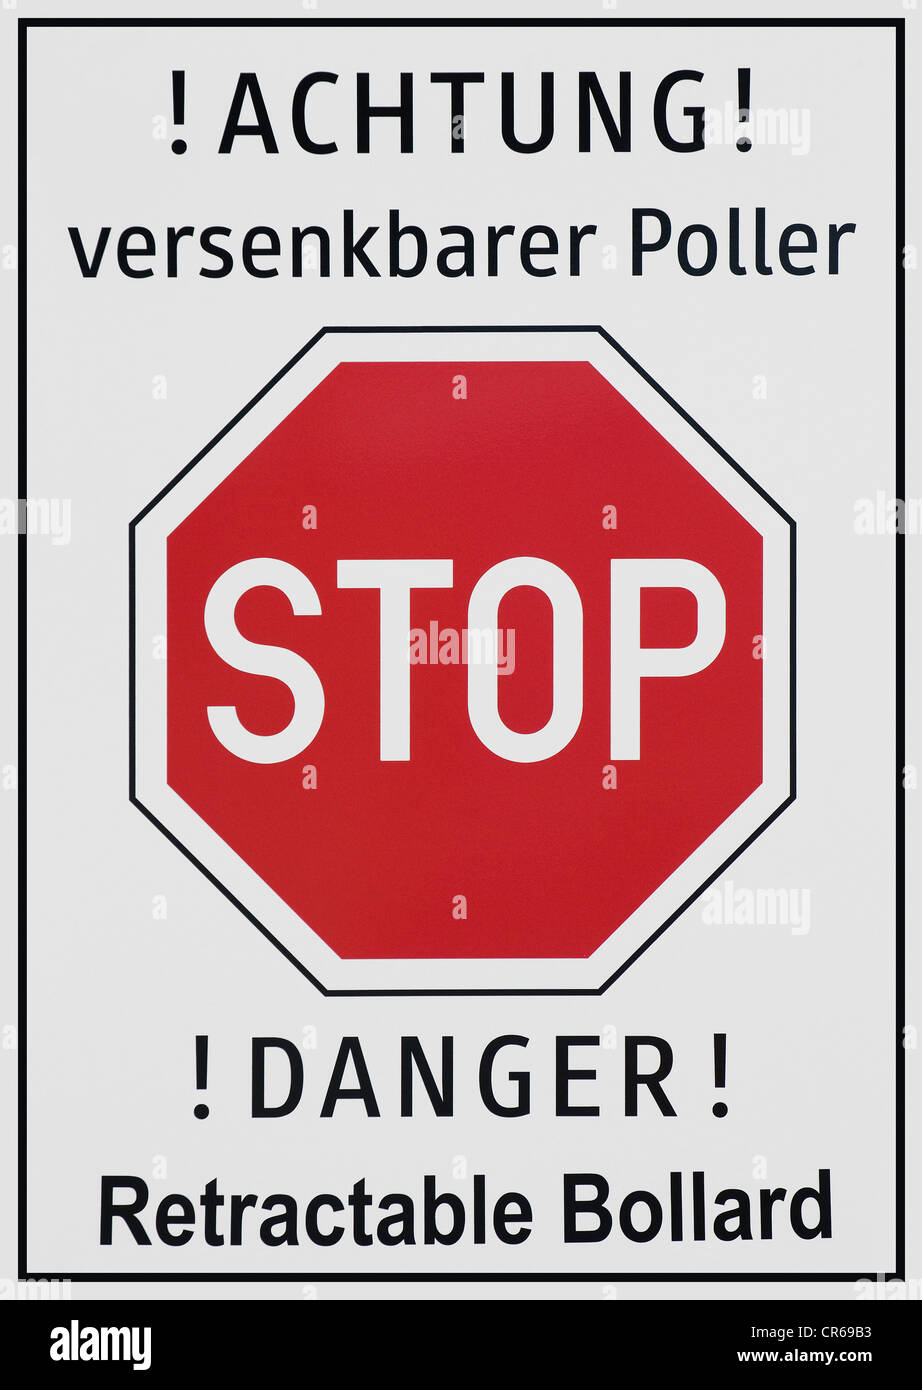 Achtung versenkbarer Poller or Danger, retractable bollard, warning sign Stock Photo